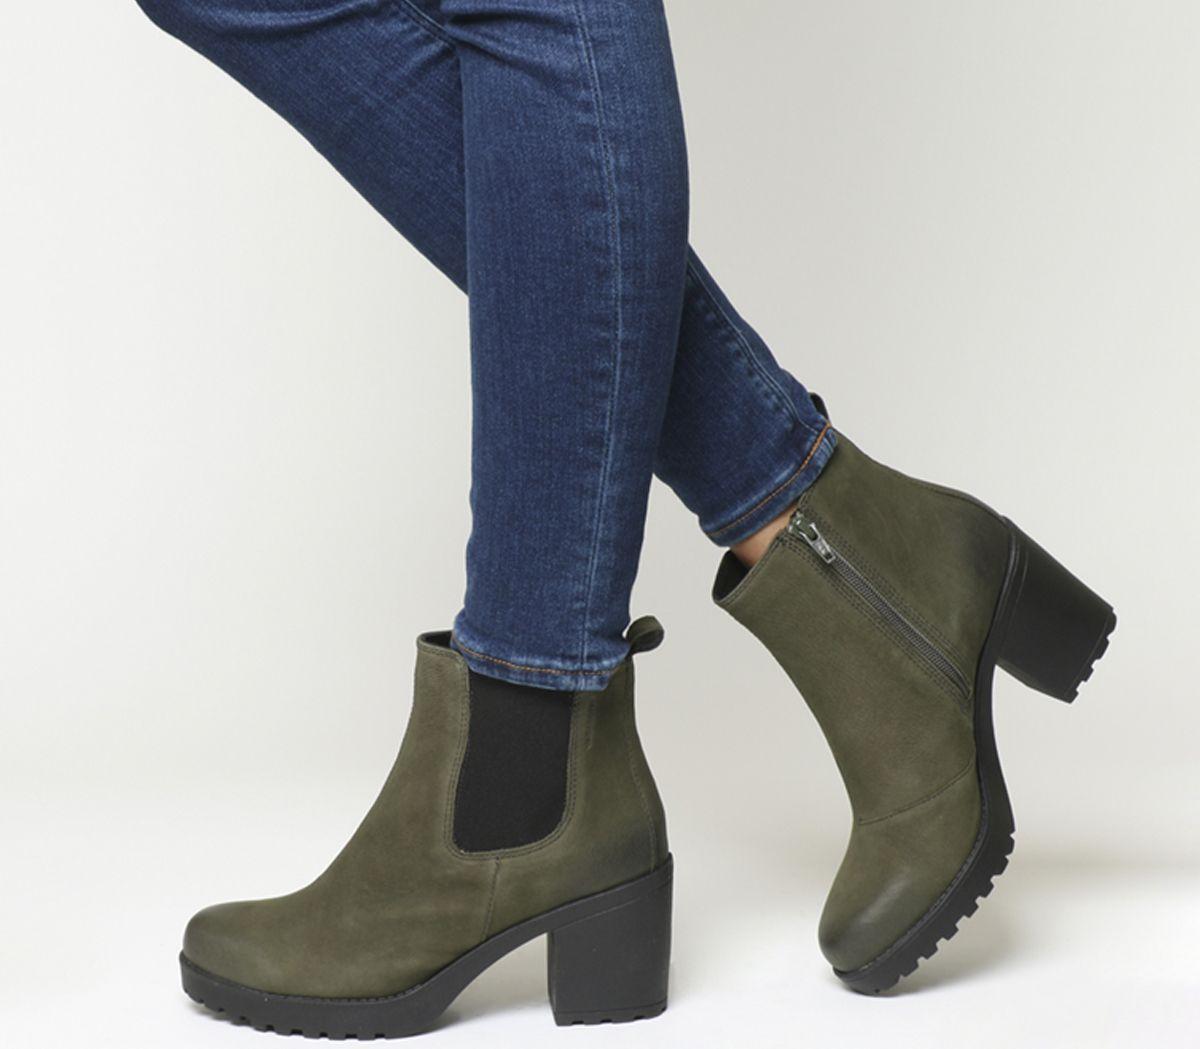 ad0274f7bec507 Vagabond Grace Chelsea Boots Dark Olive Nubuck - Ankle Boots